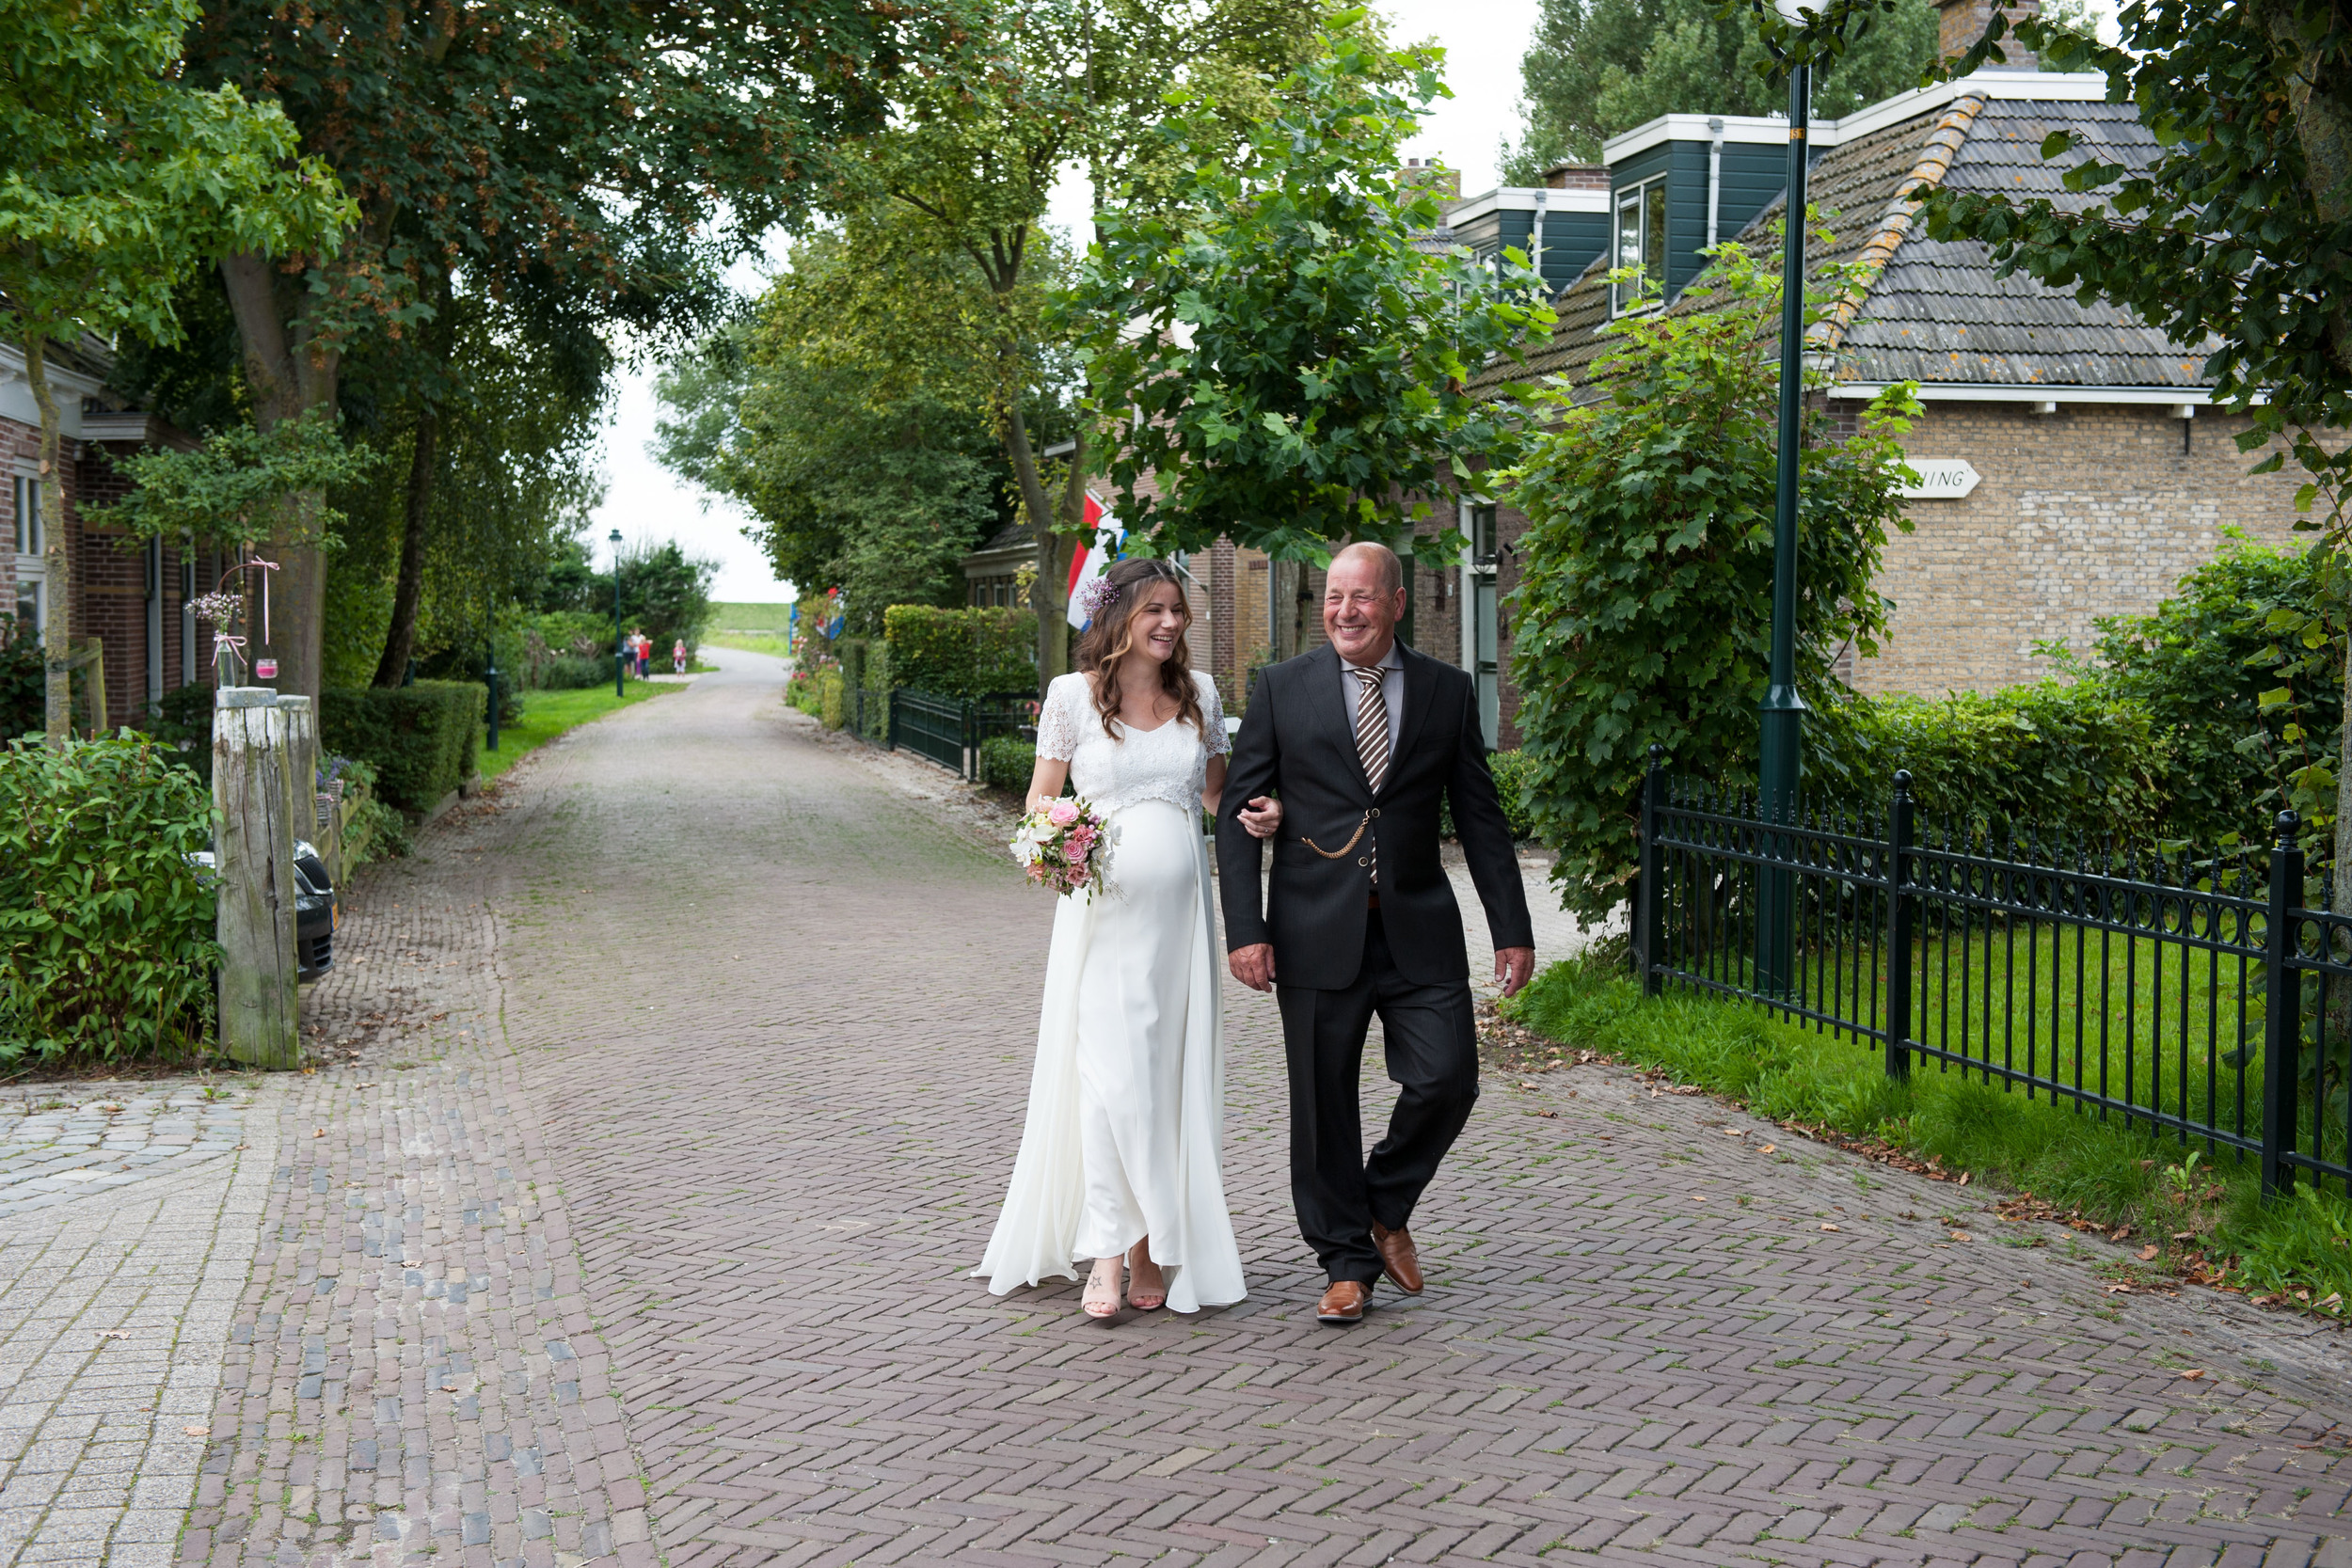 20140802_Cornwerd Wedding_2409.jpg